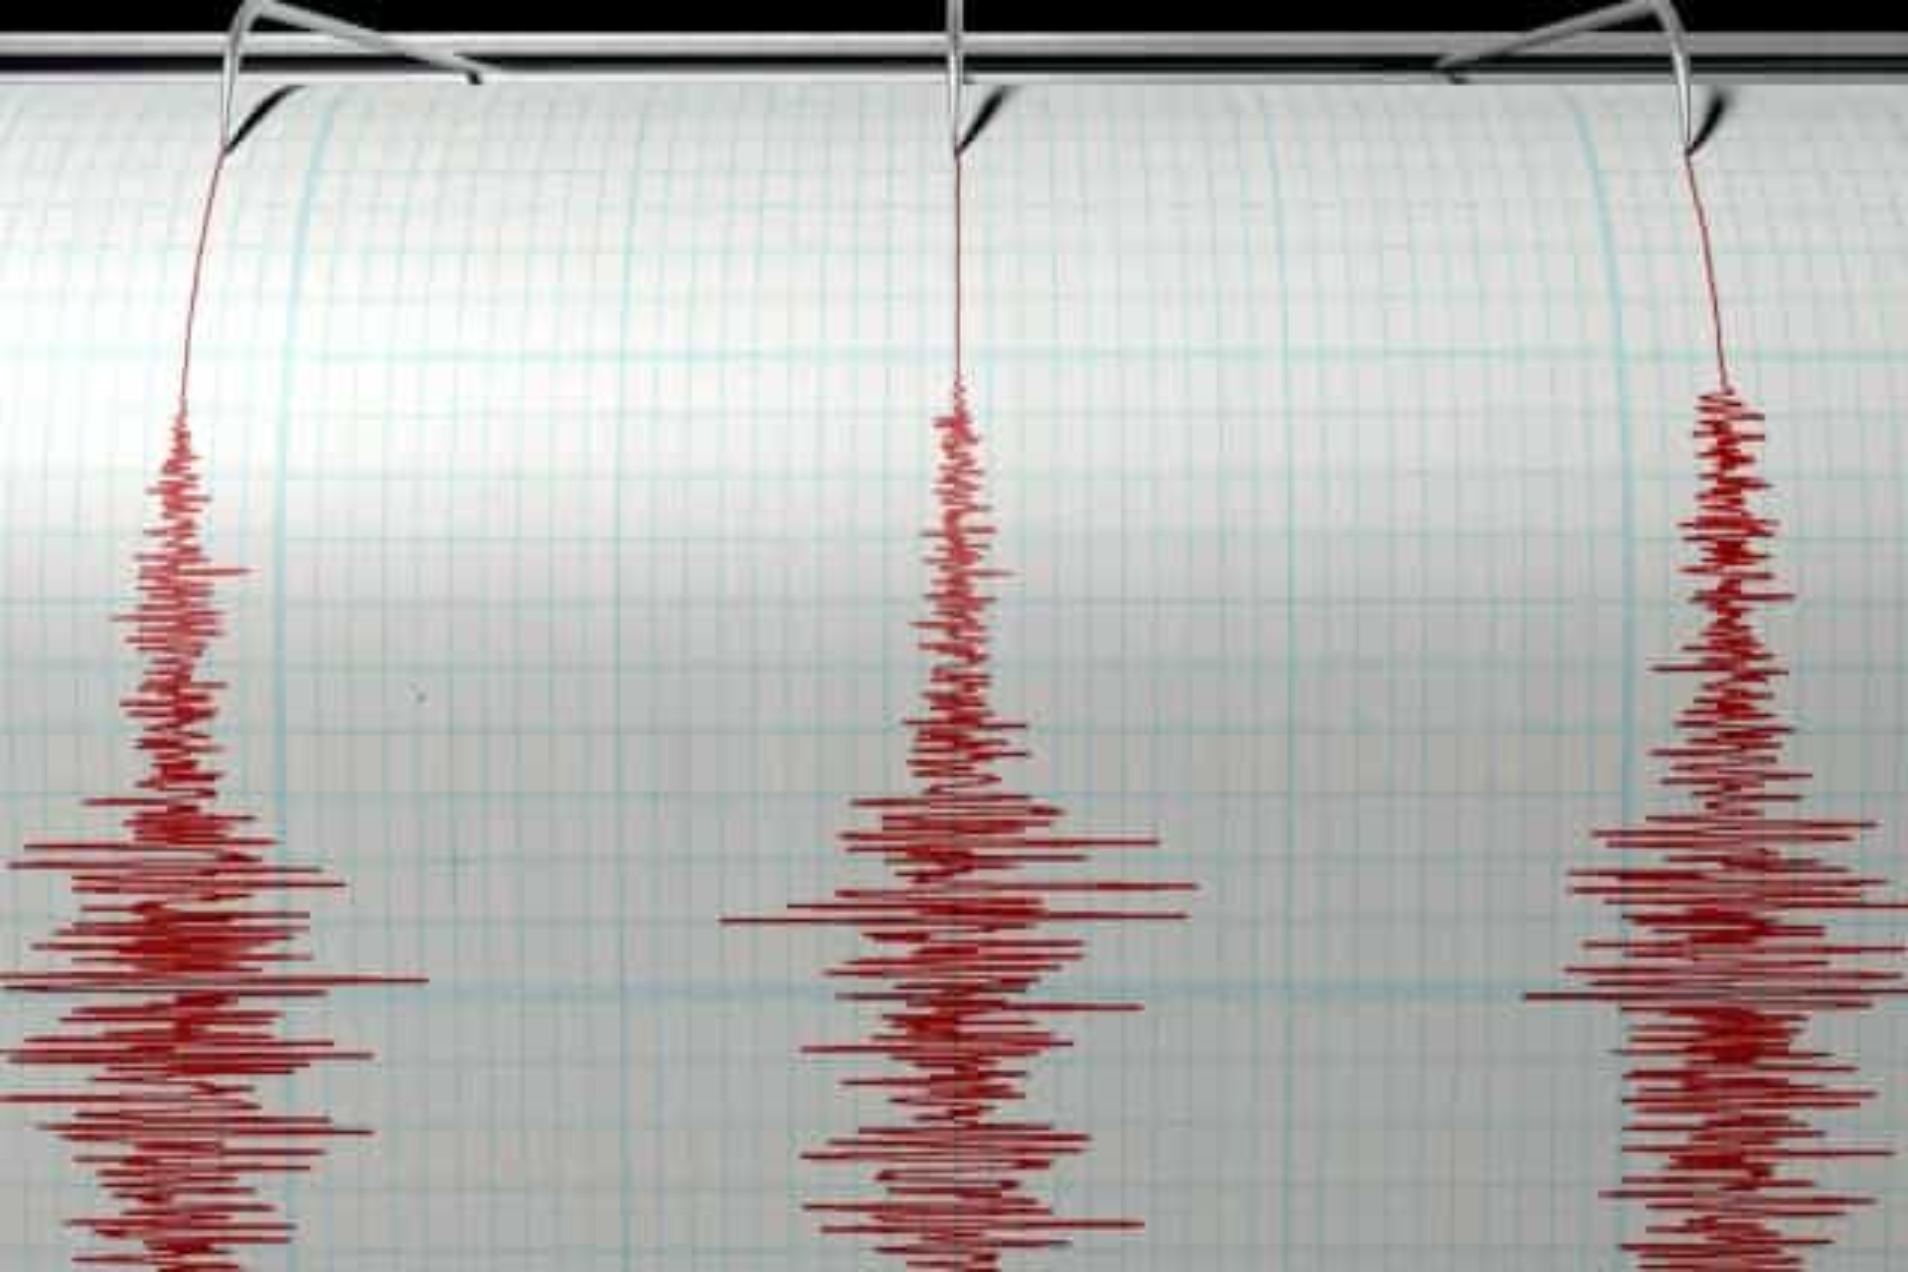 Sismo de magnitude 3,0 na escala de Richter sentido em Torre de Moncorvo